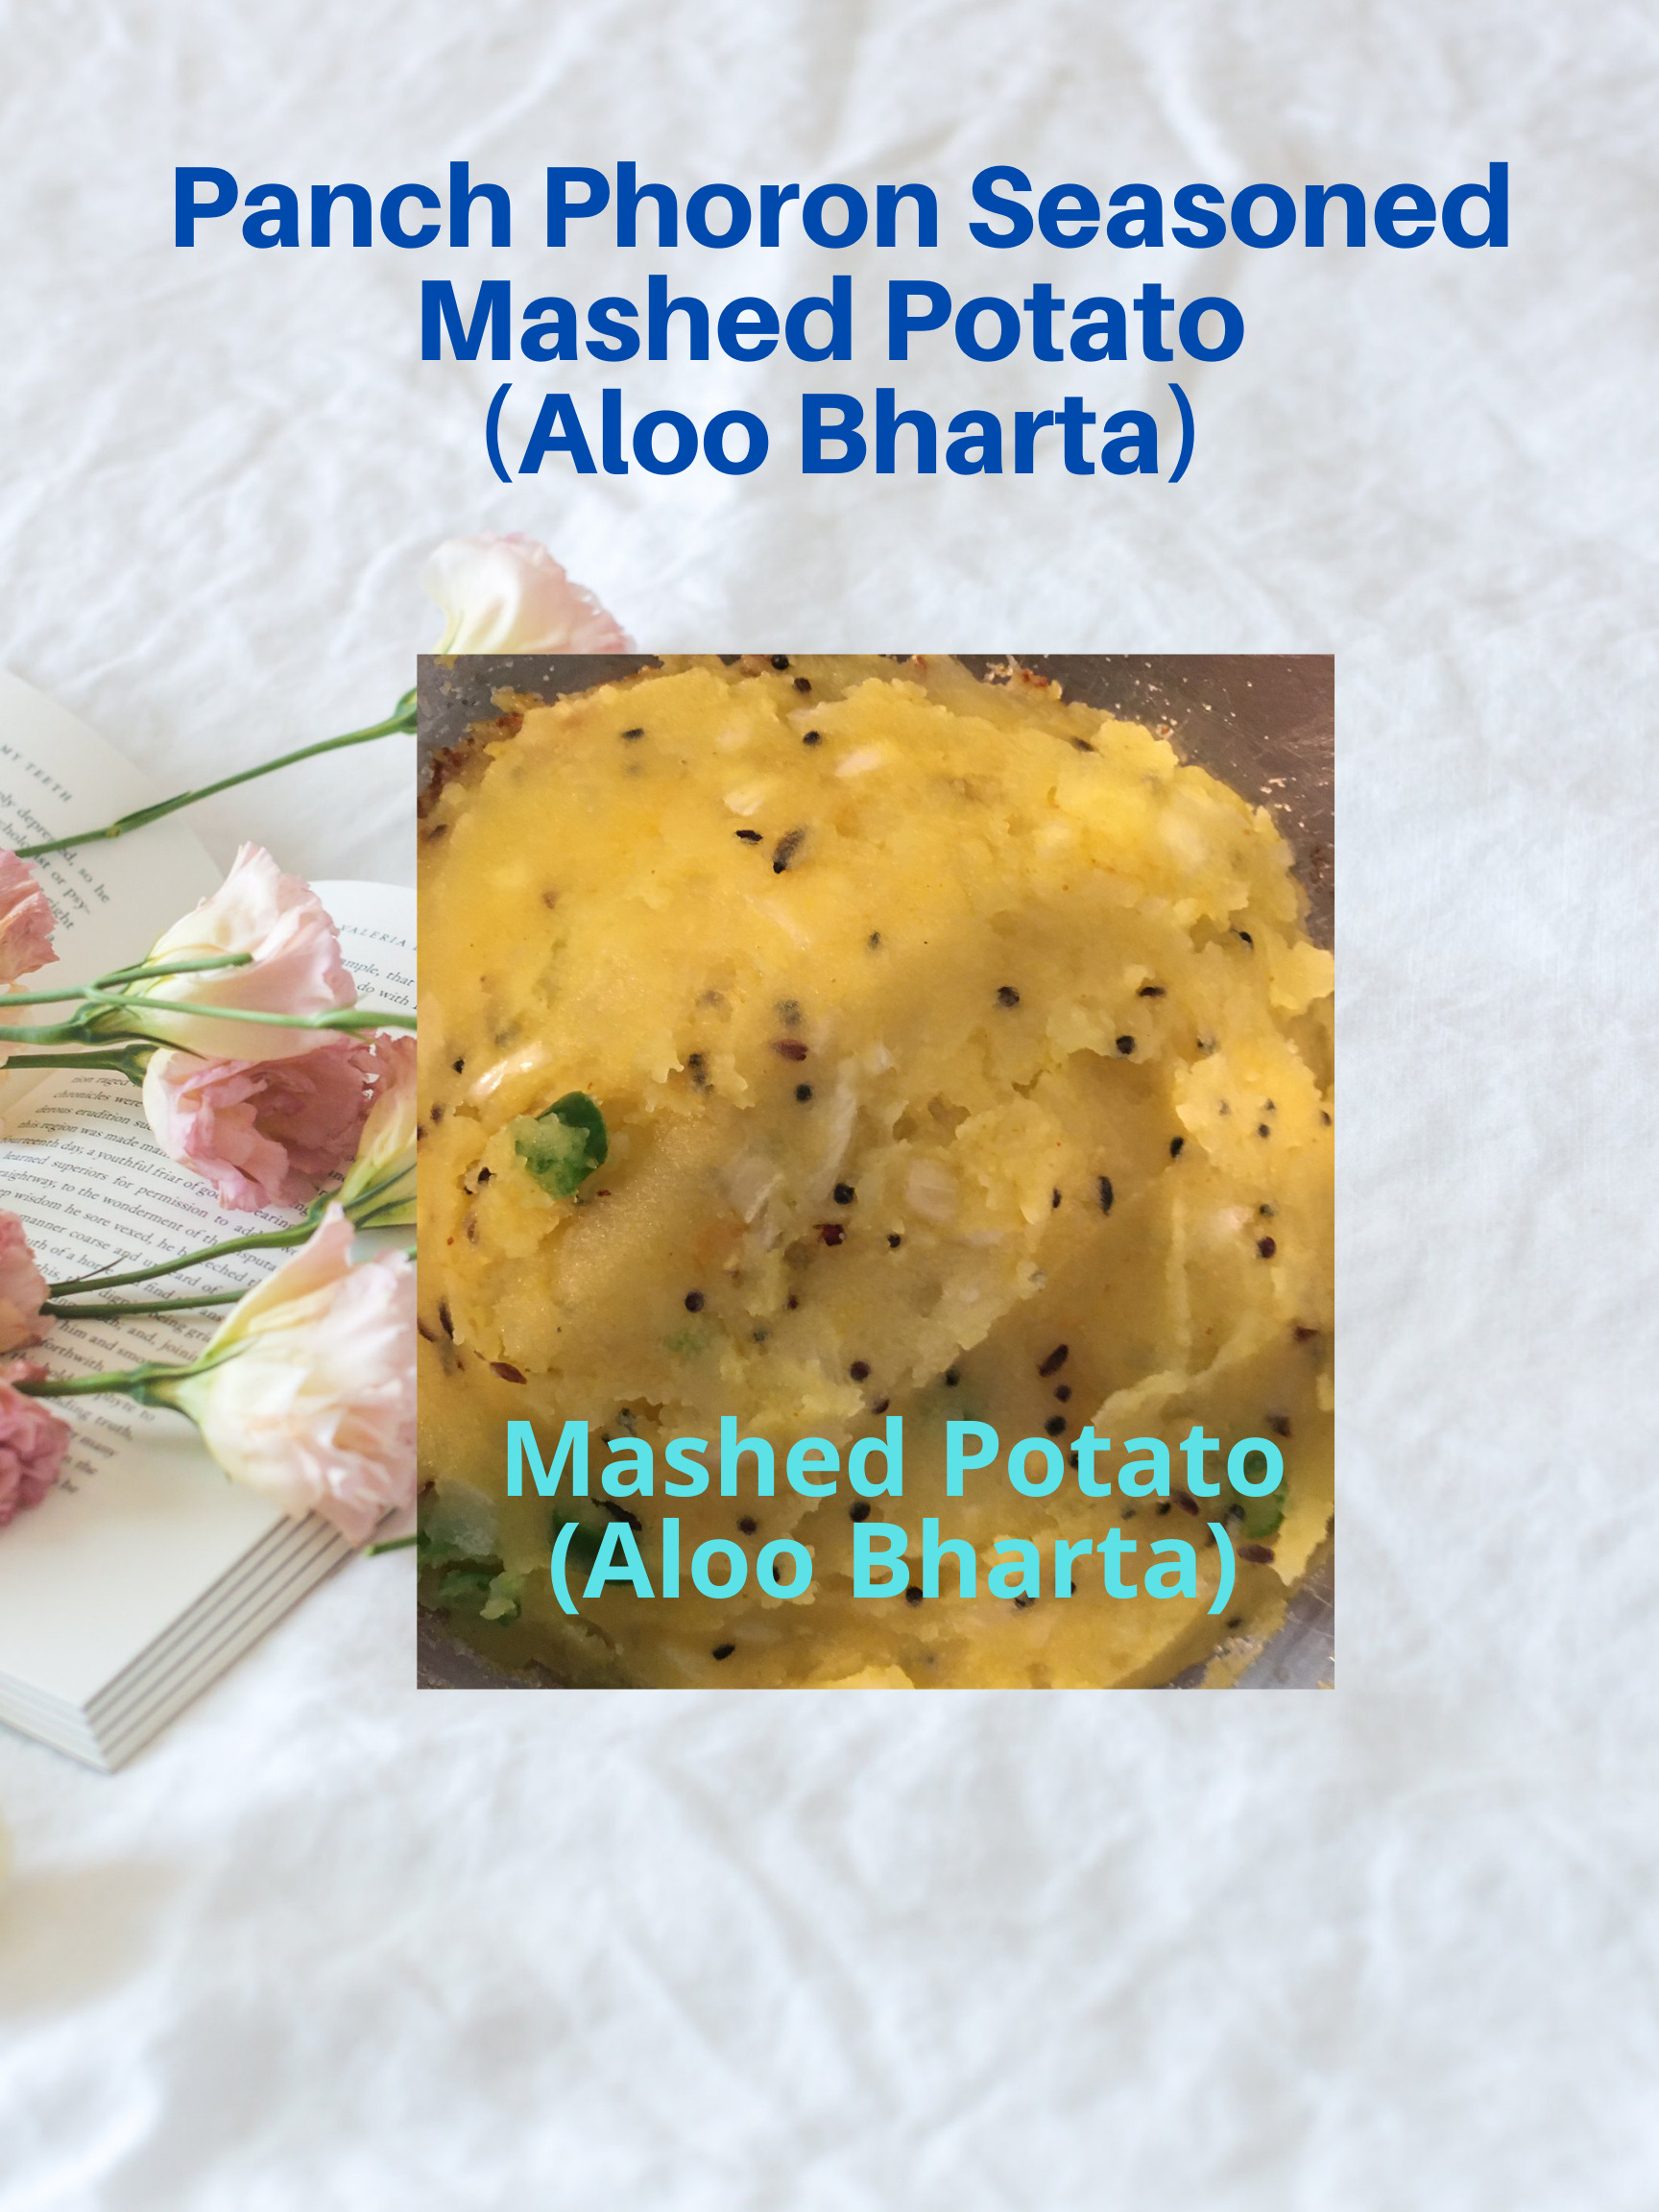 -Panch-Phoron-Seasoned-Mashed-Potato